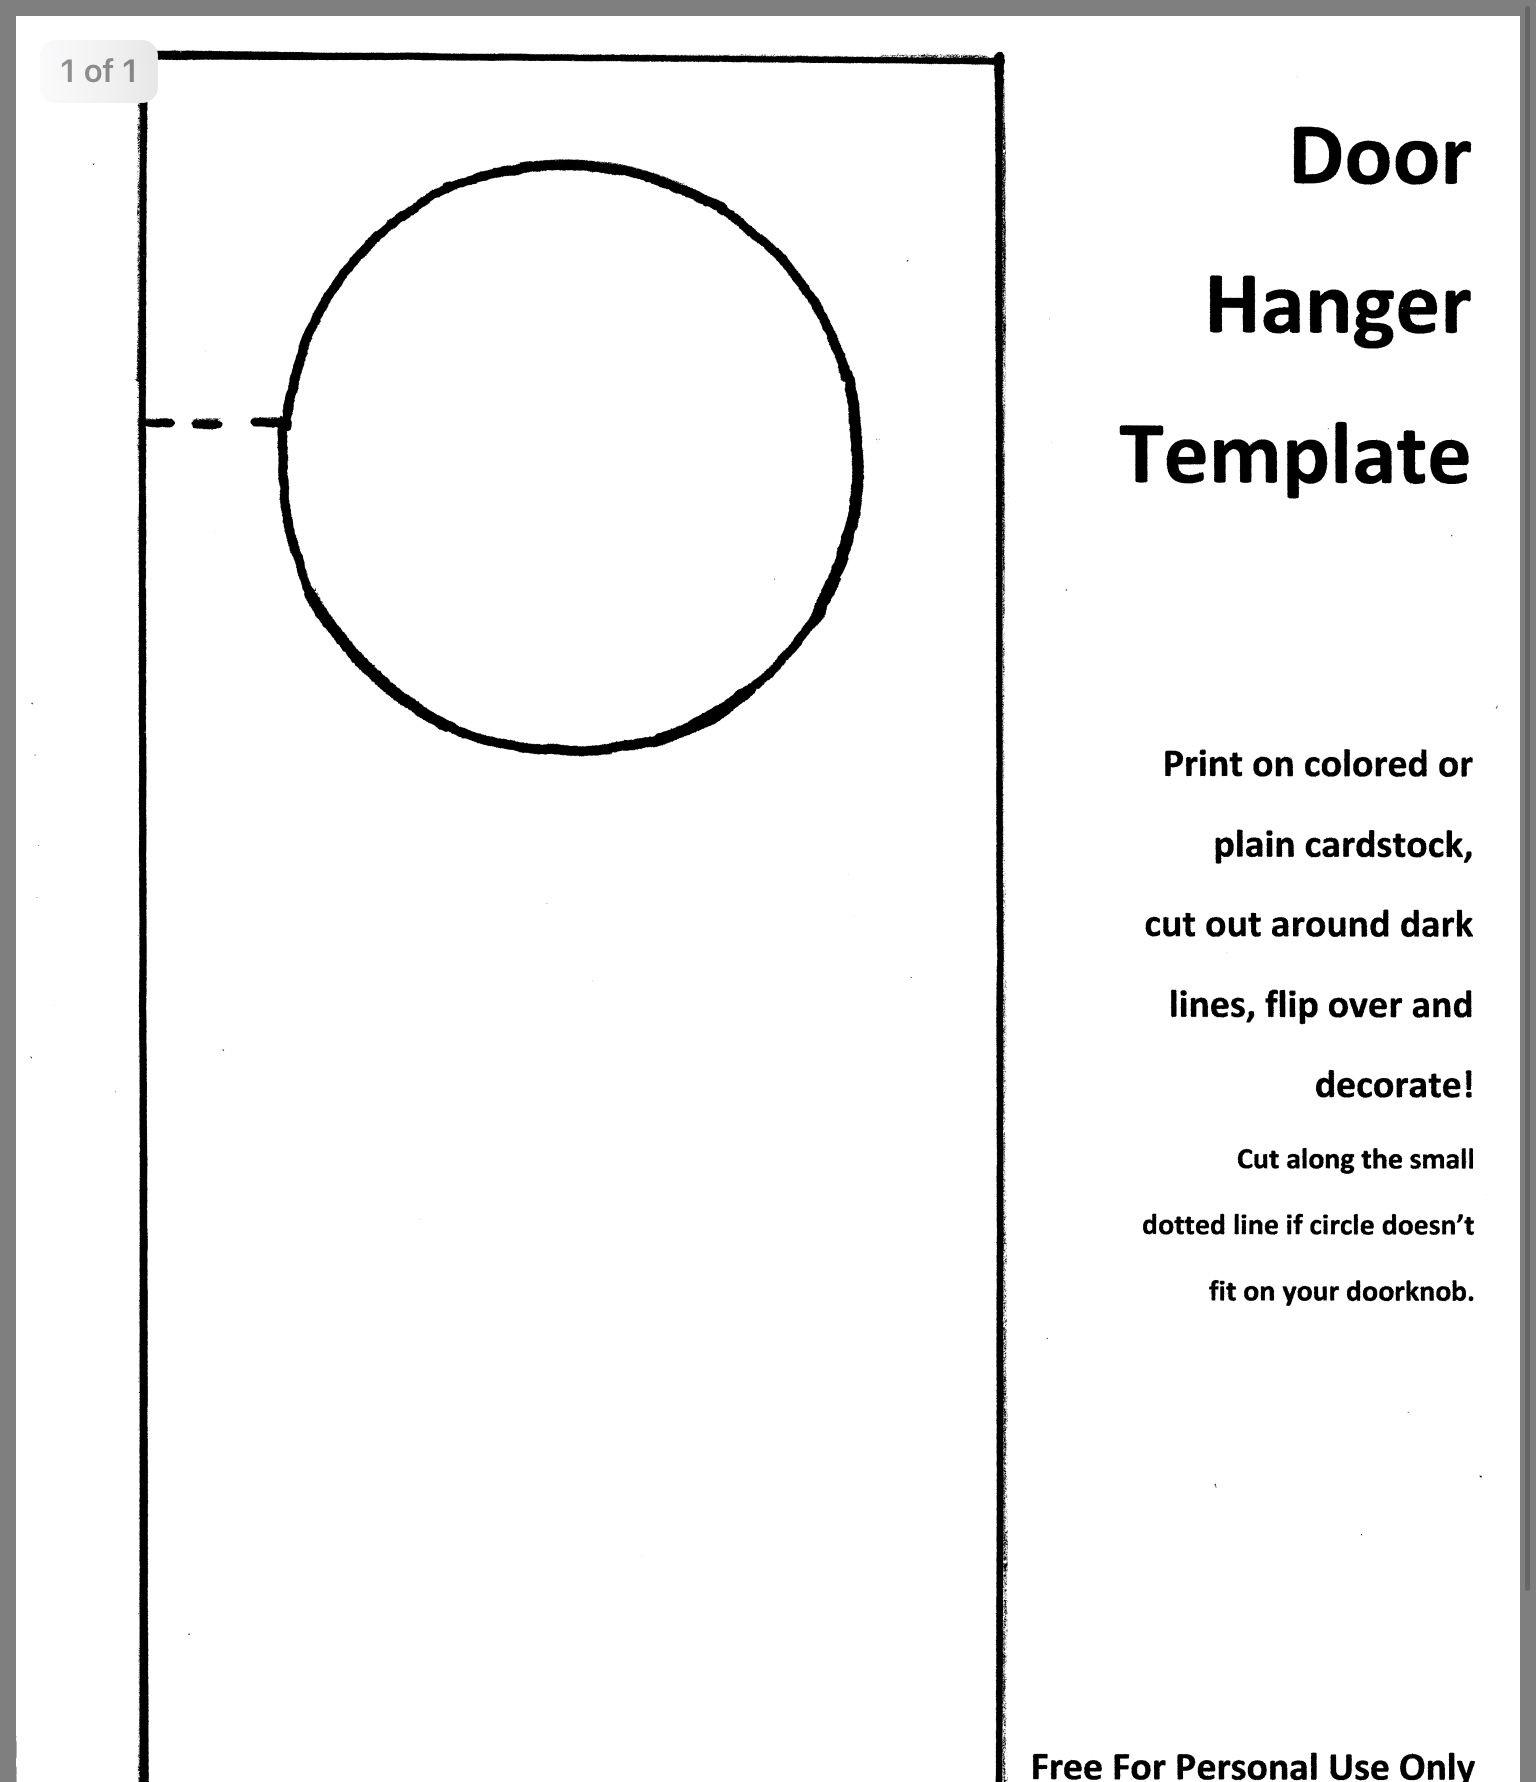 000 Wonderful Door Hanger Template For Word Photo  Free MicrosoftFull